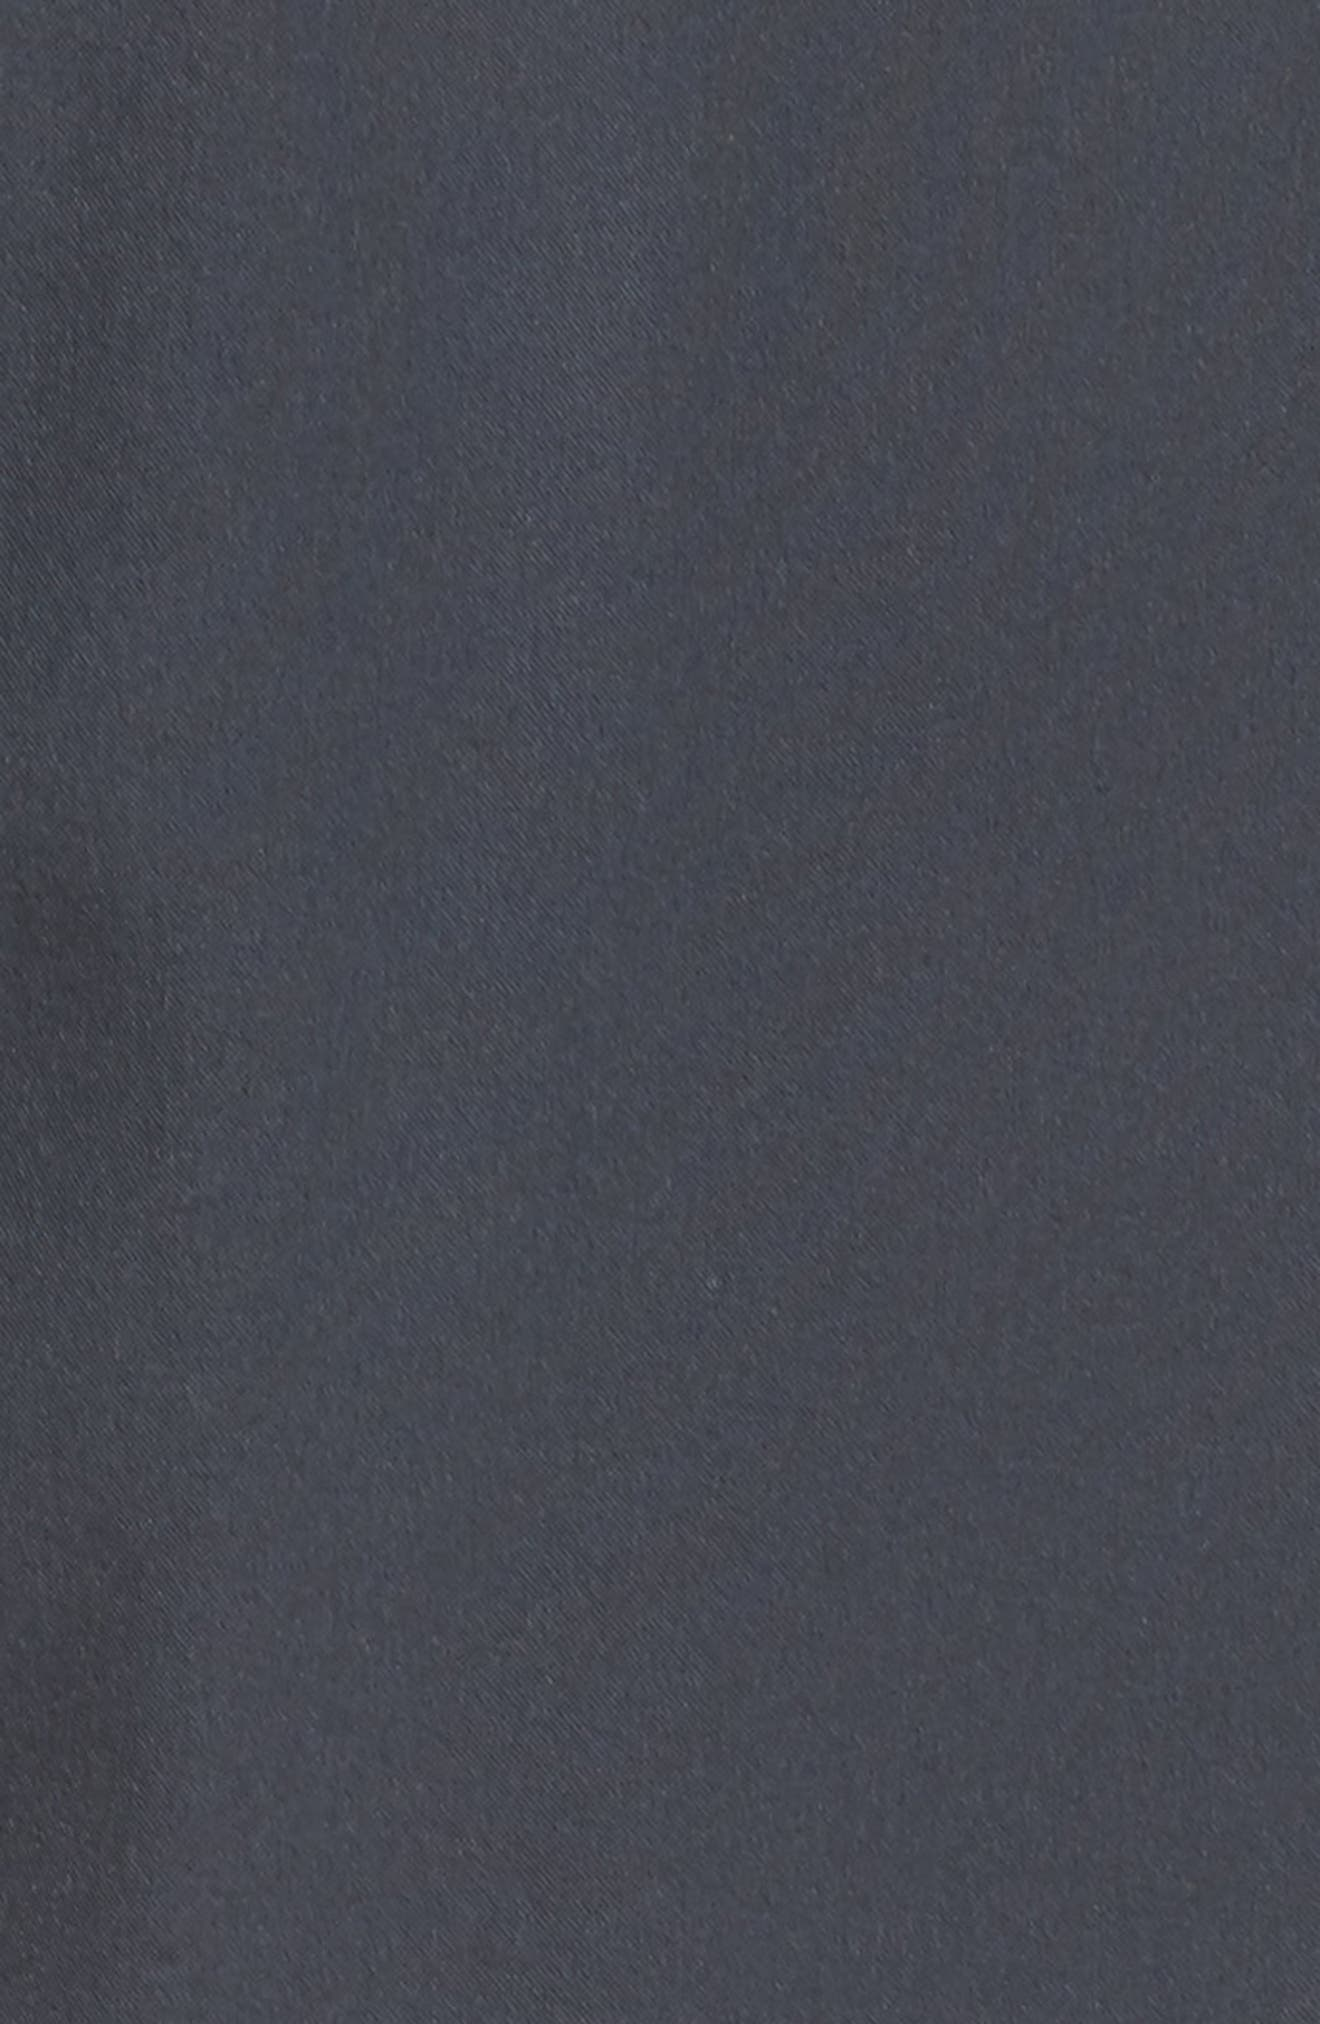 Chaser 3 Shorts,                             Alternate thumbnail 6, color,                             ASPHALT